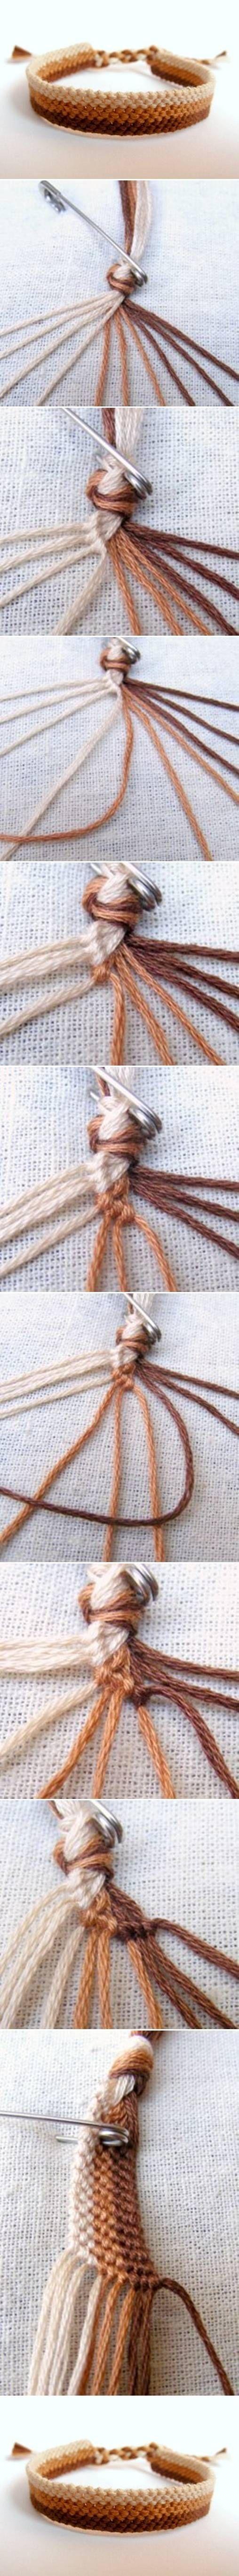 DIY Easy Weave Bracelet by christina.feyduncan